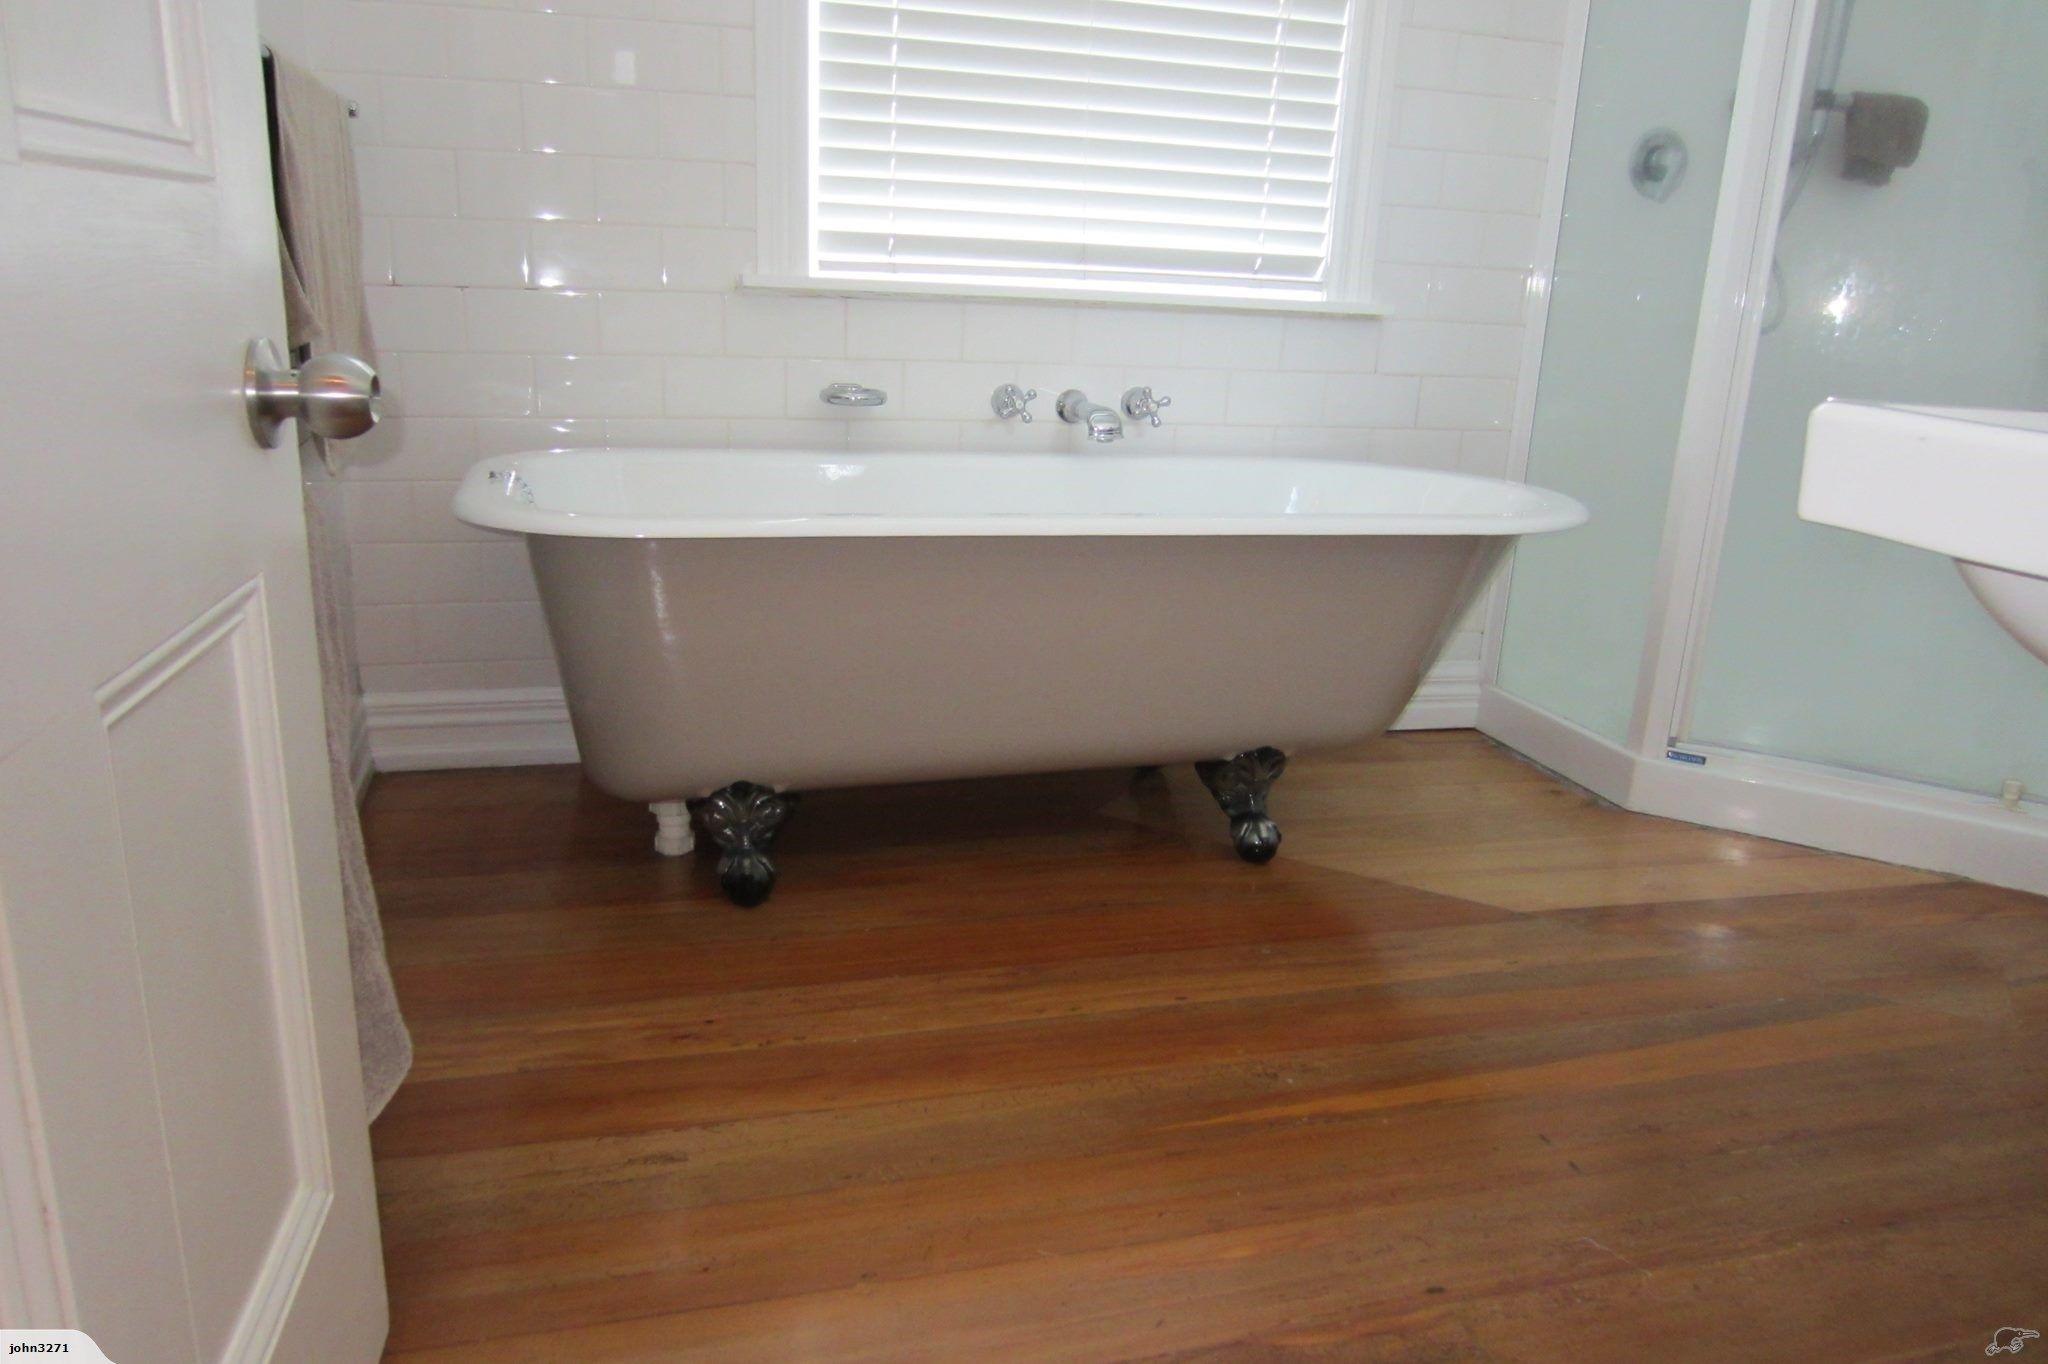 Claw foot bath | Trade Me